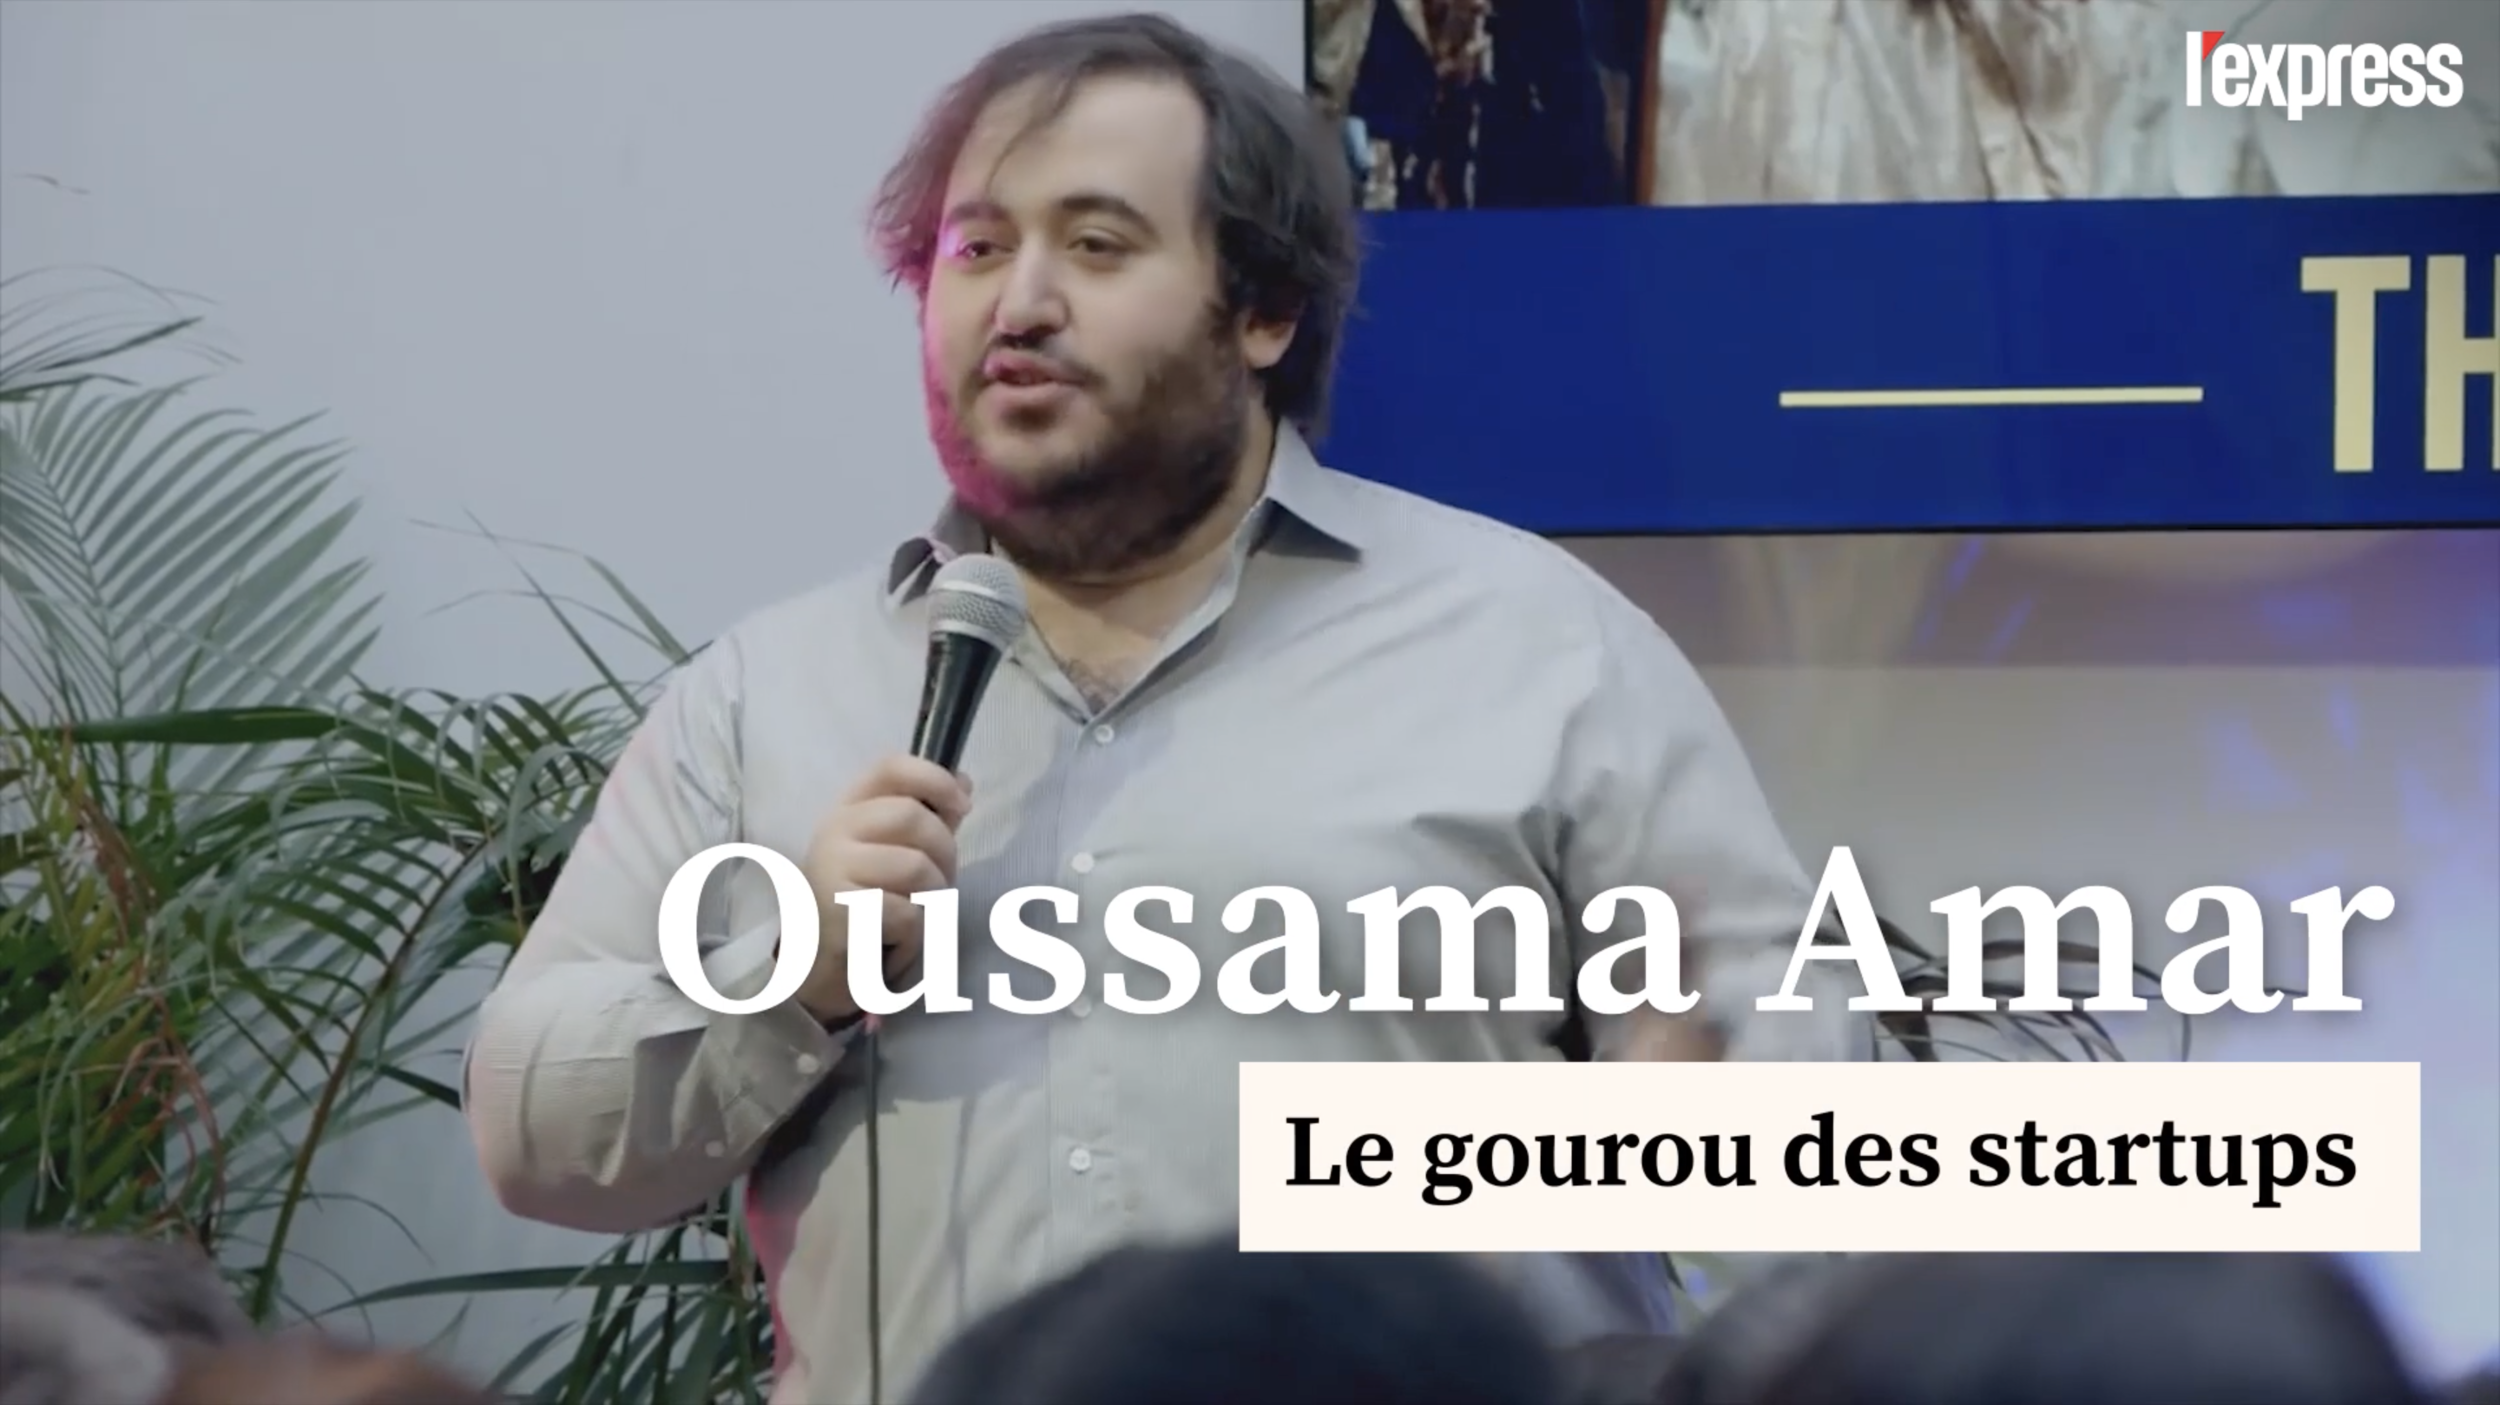 Oussama_Ammar.png